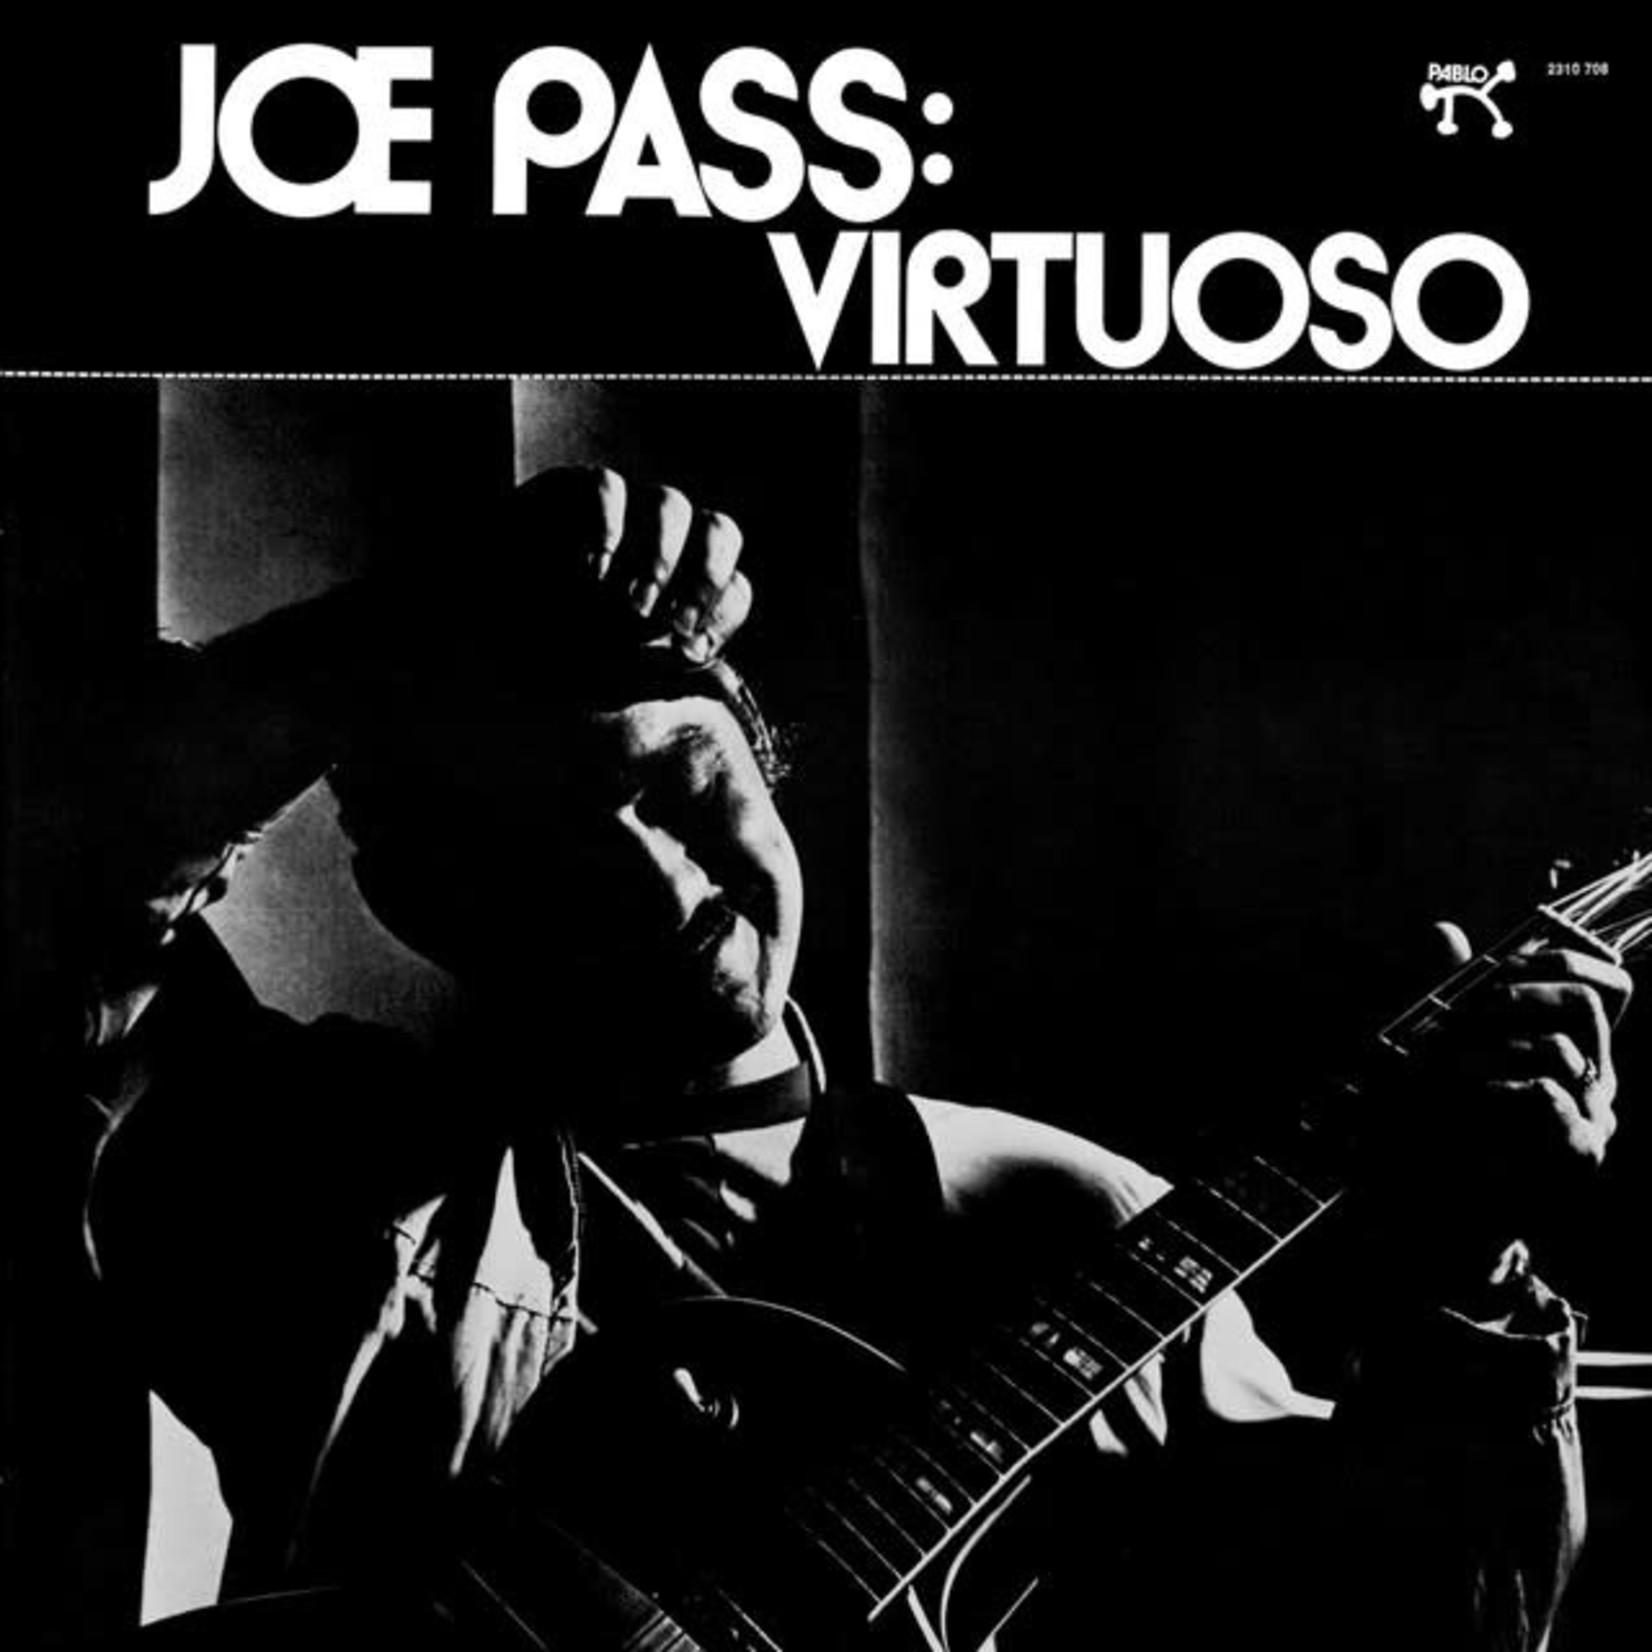 Vinyl Joe Pass - Virtuoso